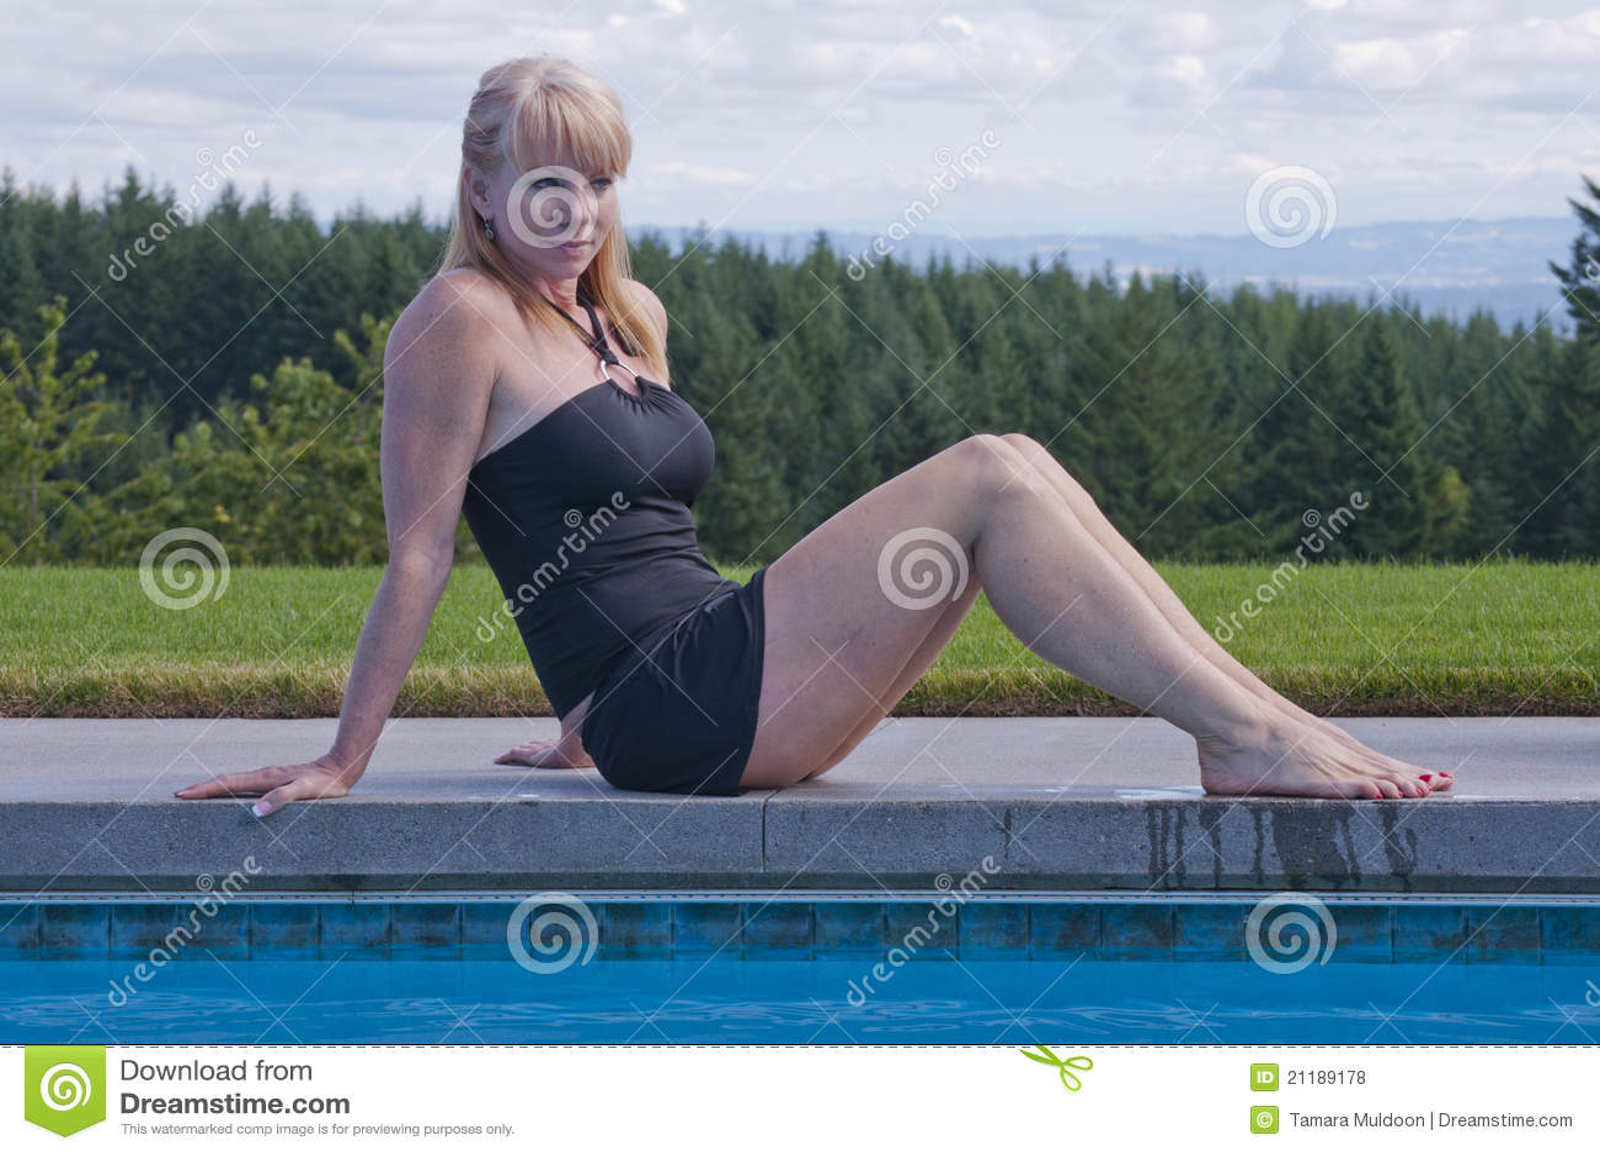 Laughing woman at swim pool